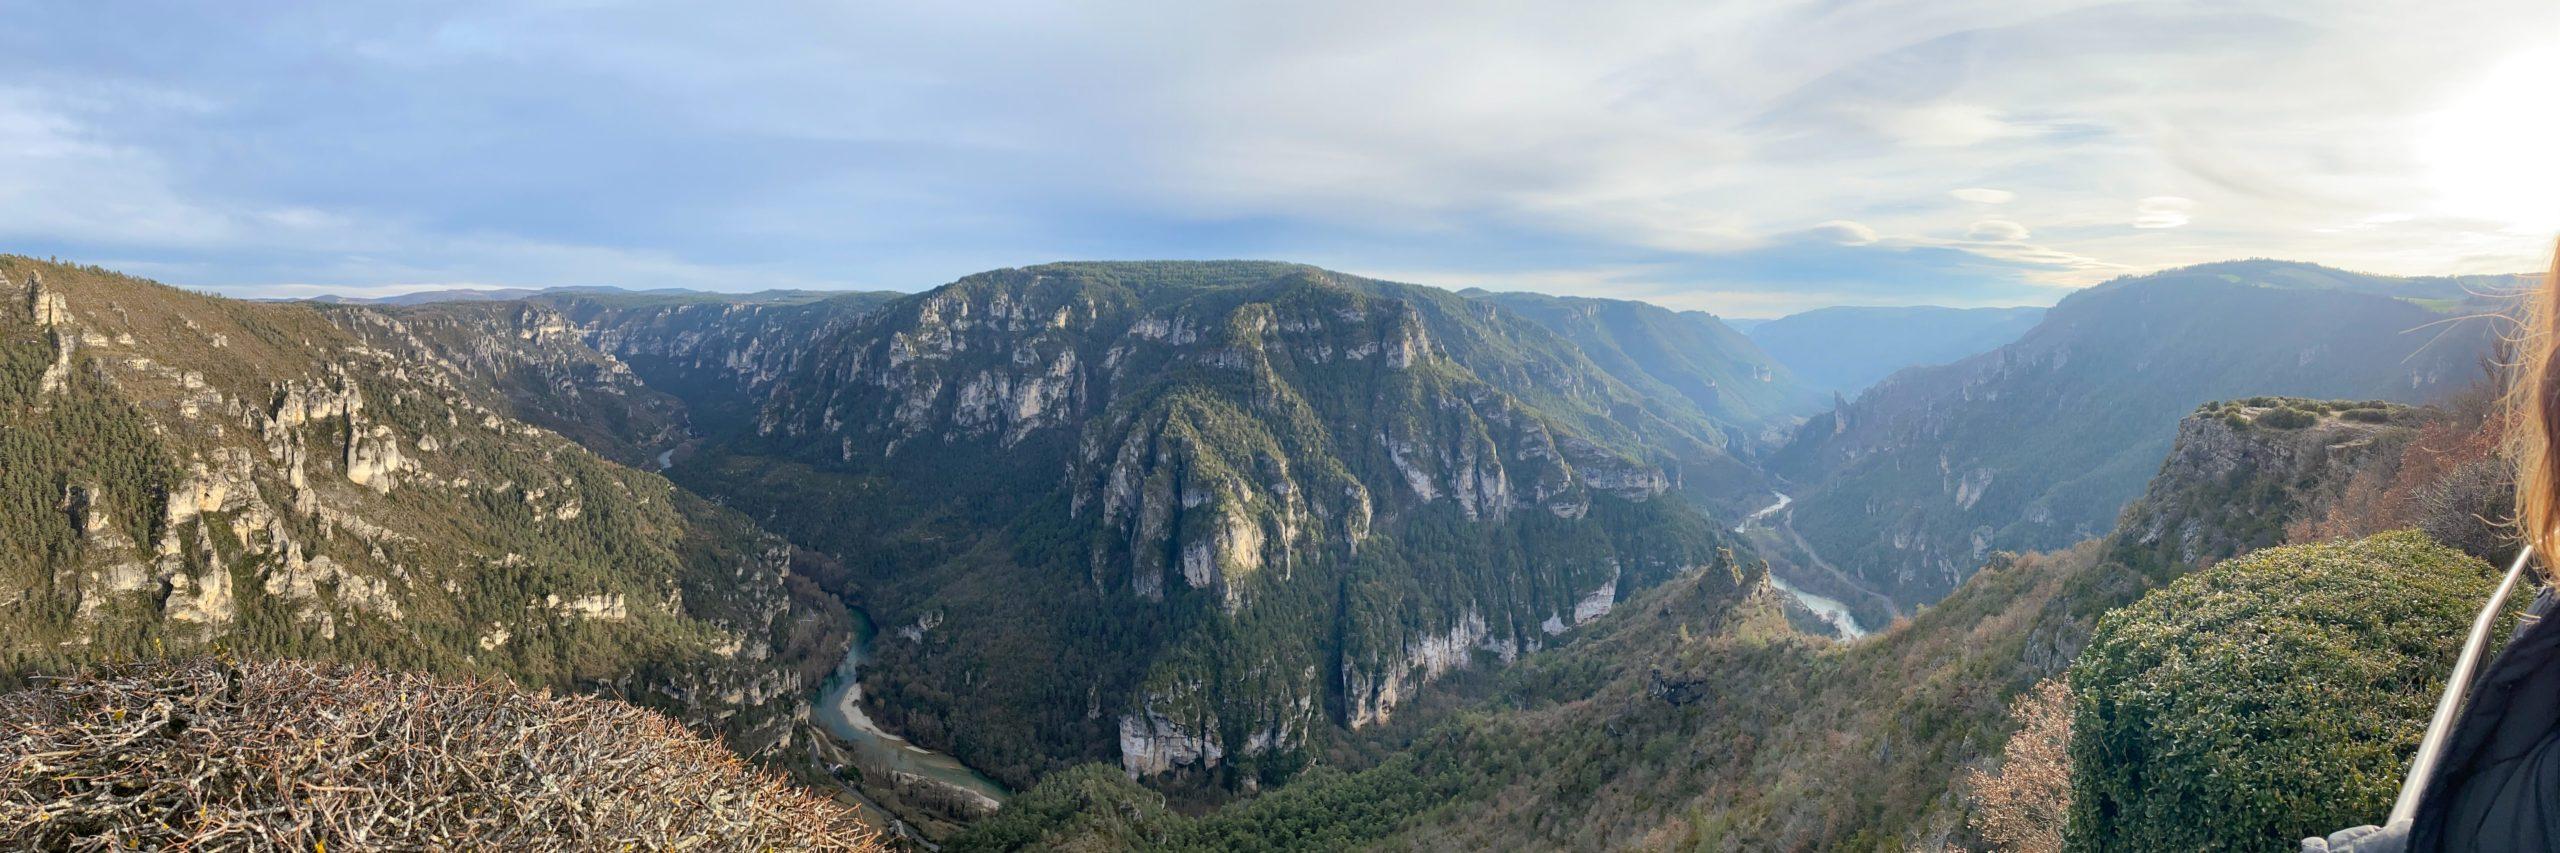 gorges-du-tarn-point-sublime-scaled-aspect-ratio-1800-600